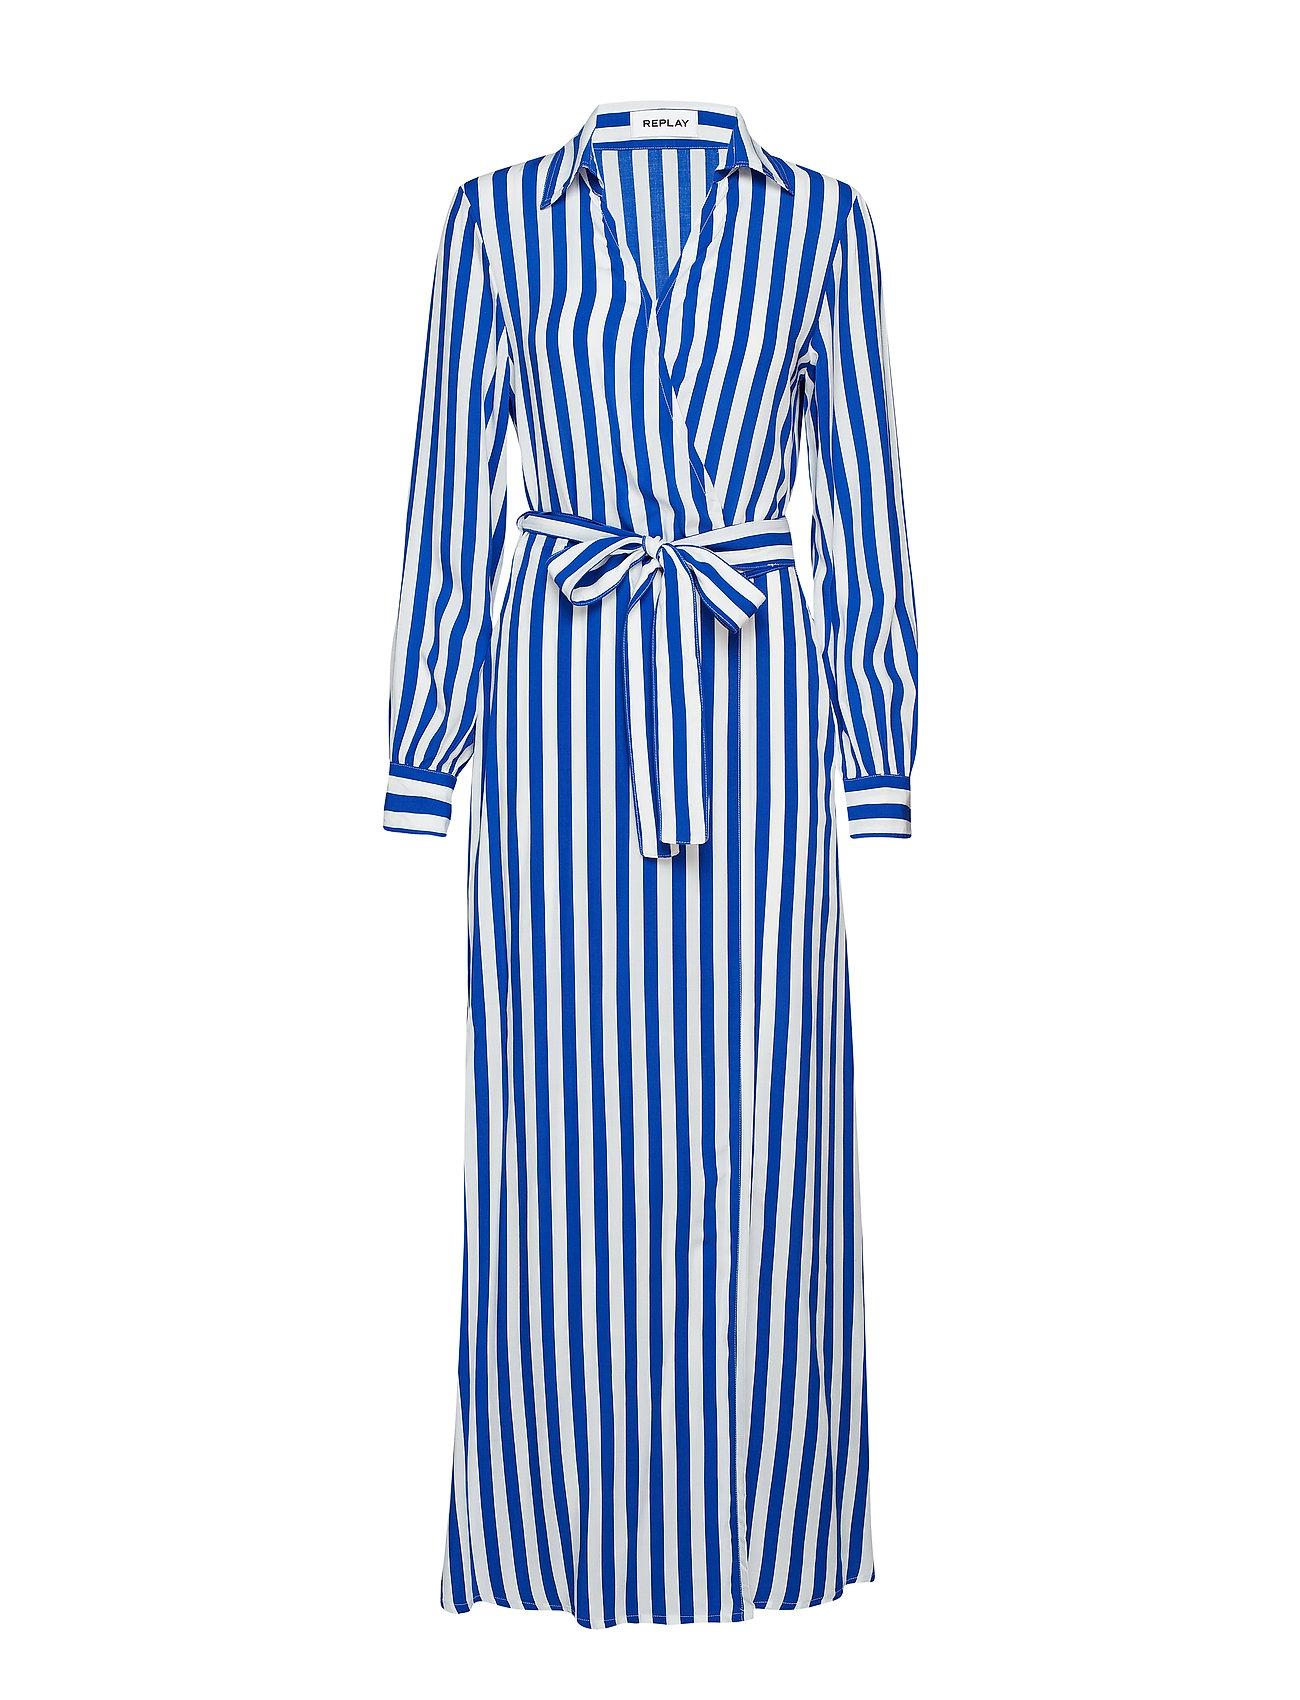 Replay Dress - CYAN-WHITE